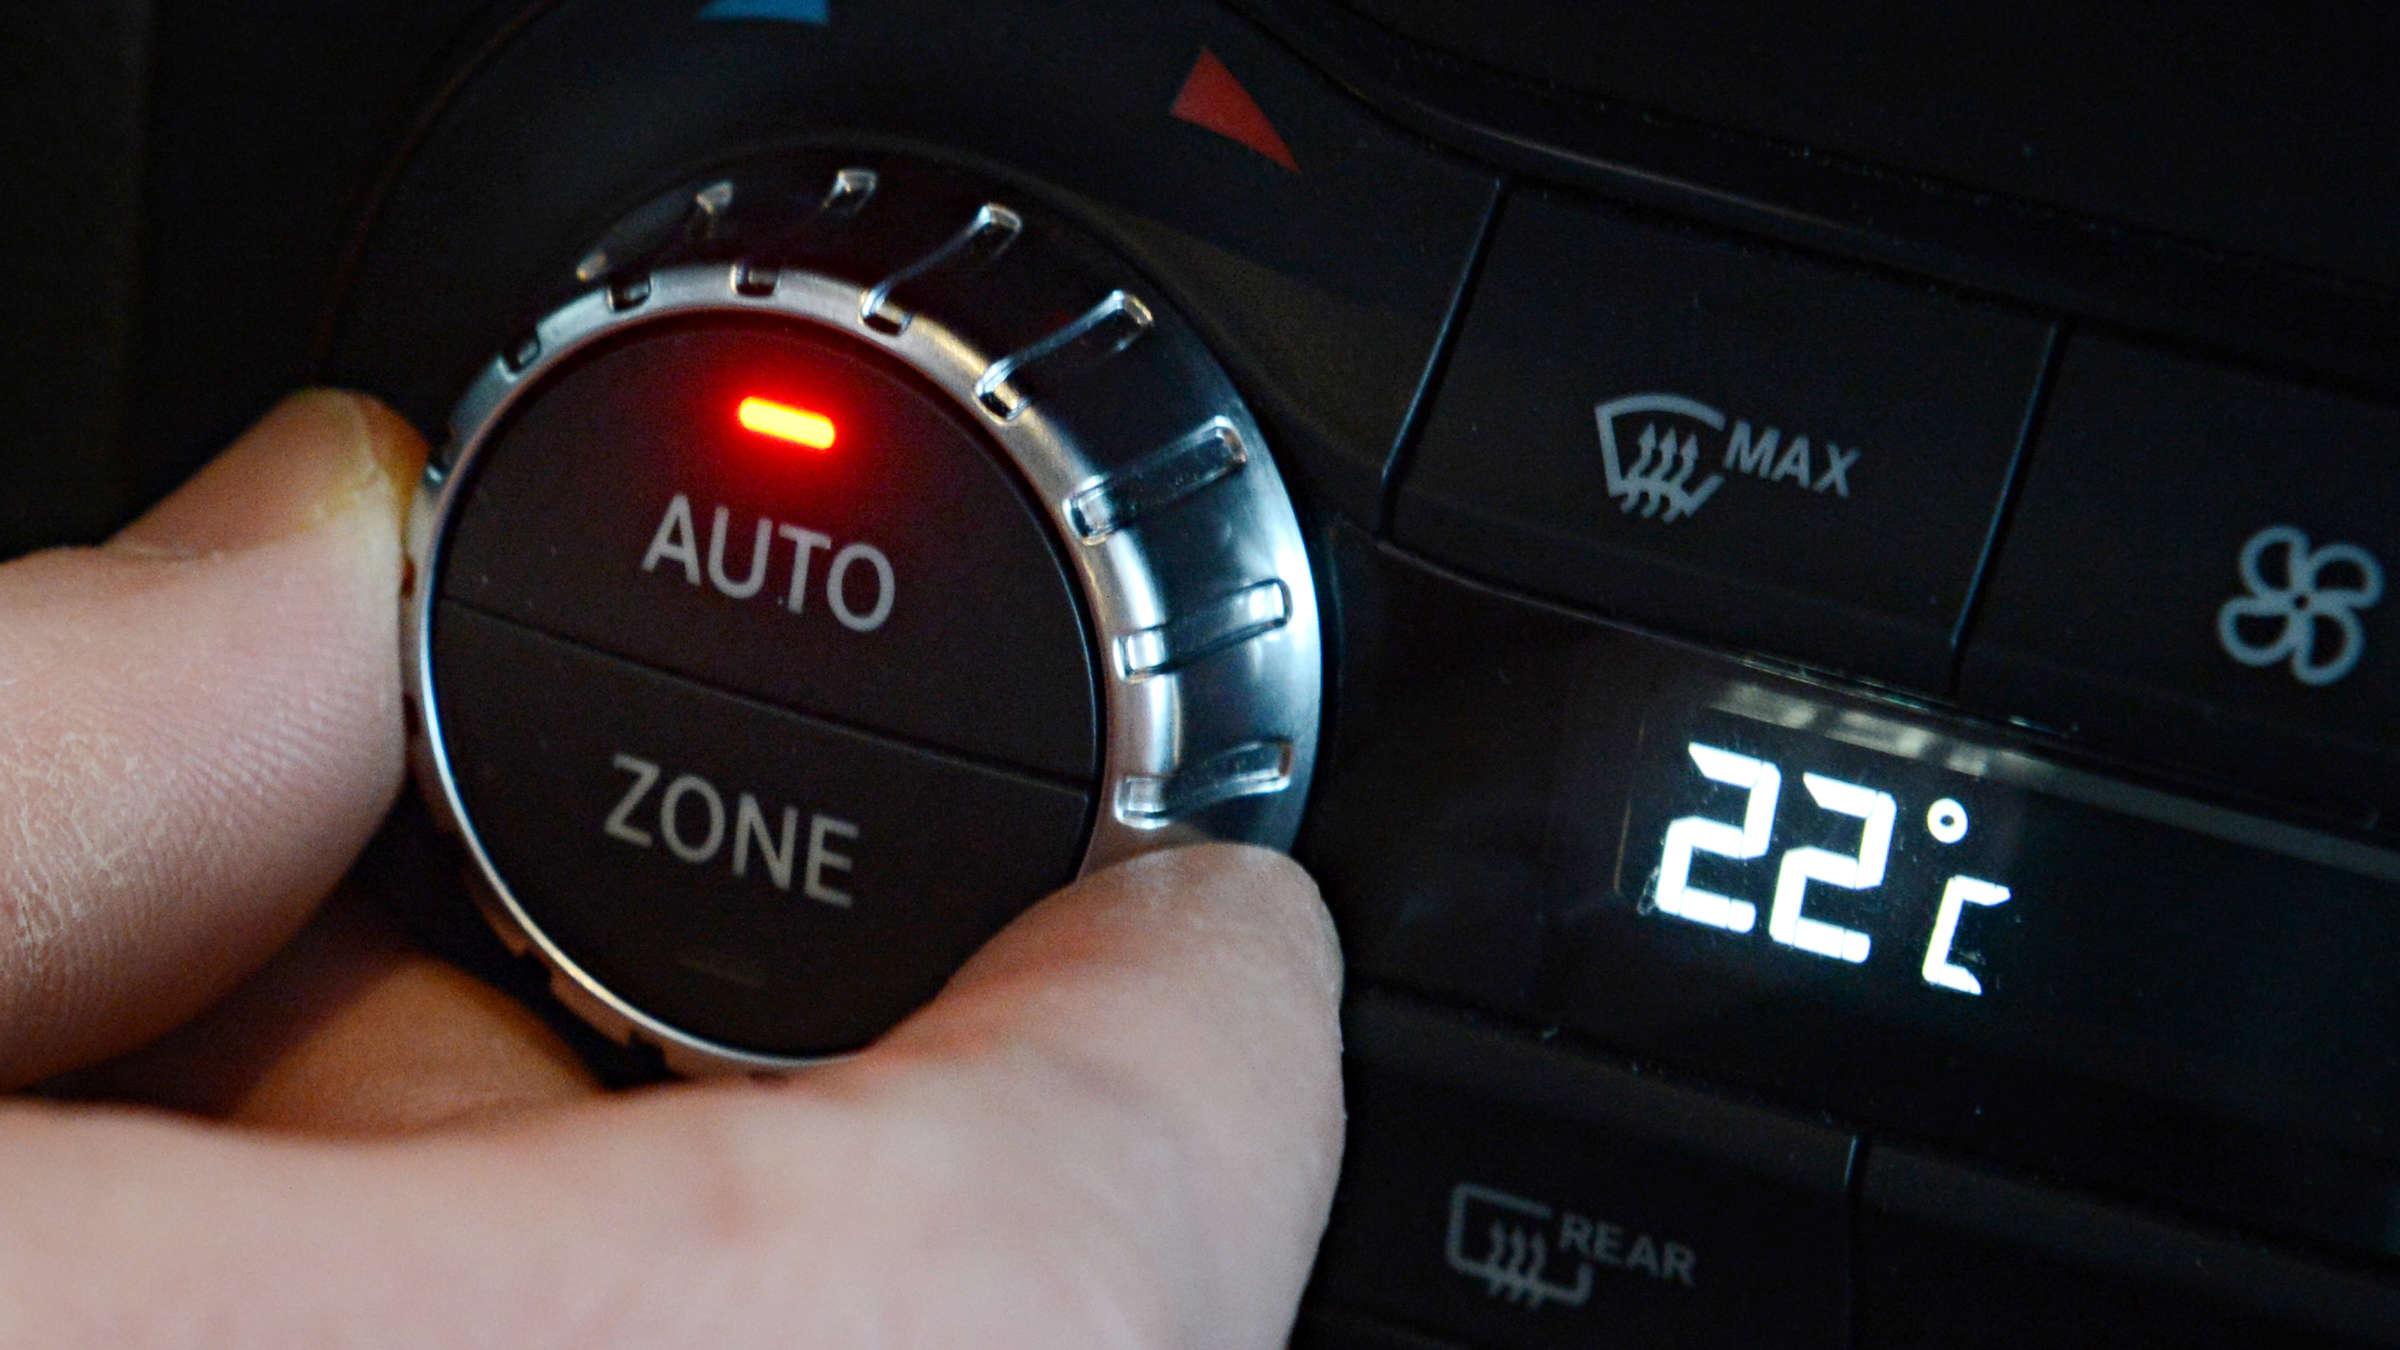 Full Size of Geruch Auto Neutralisieren Ozon Geruch In Auto Neutralisieren Tabak Geruch Neutralisieren Auto Rauch Geruch Neutralisieren Auto Küche Gerüche Neutralisieren Auto